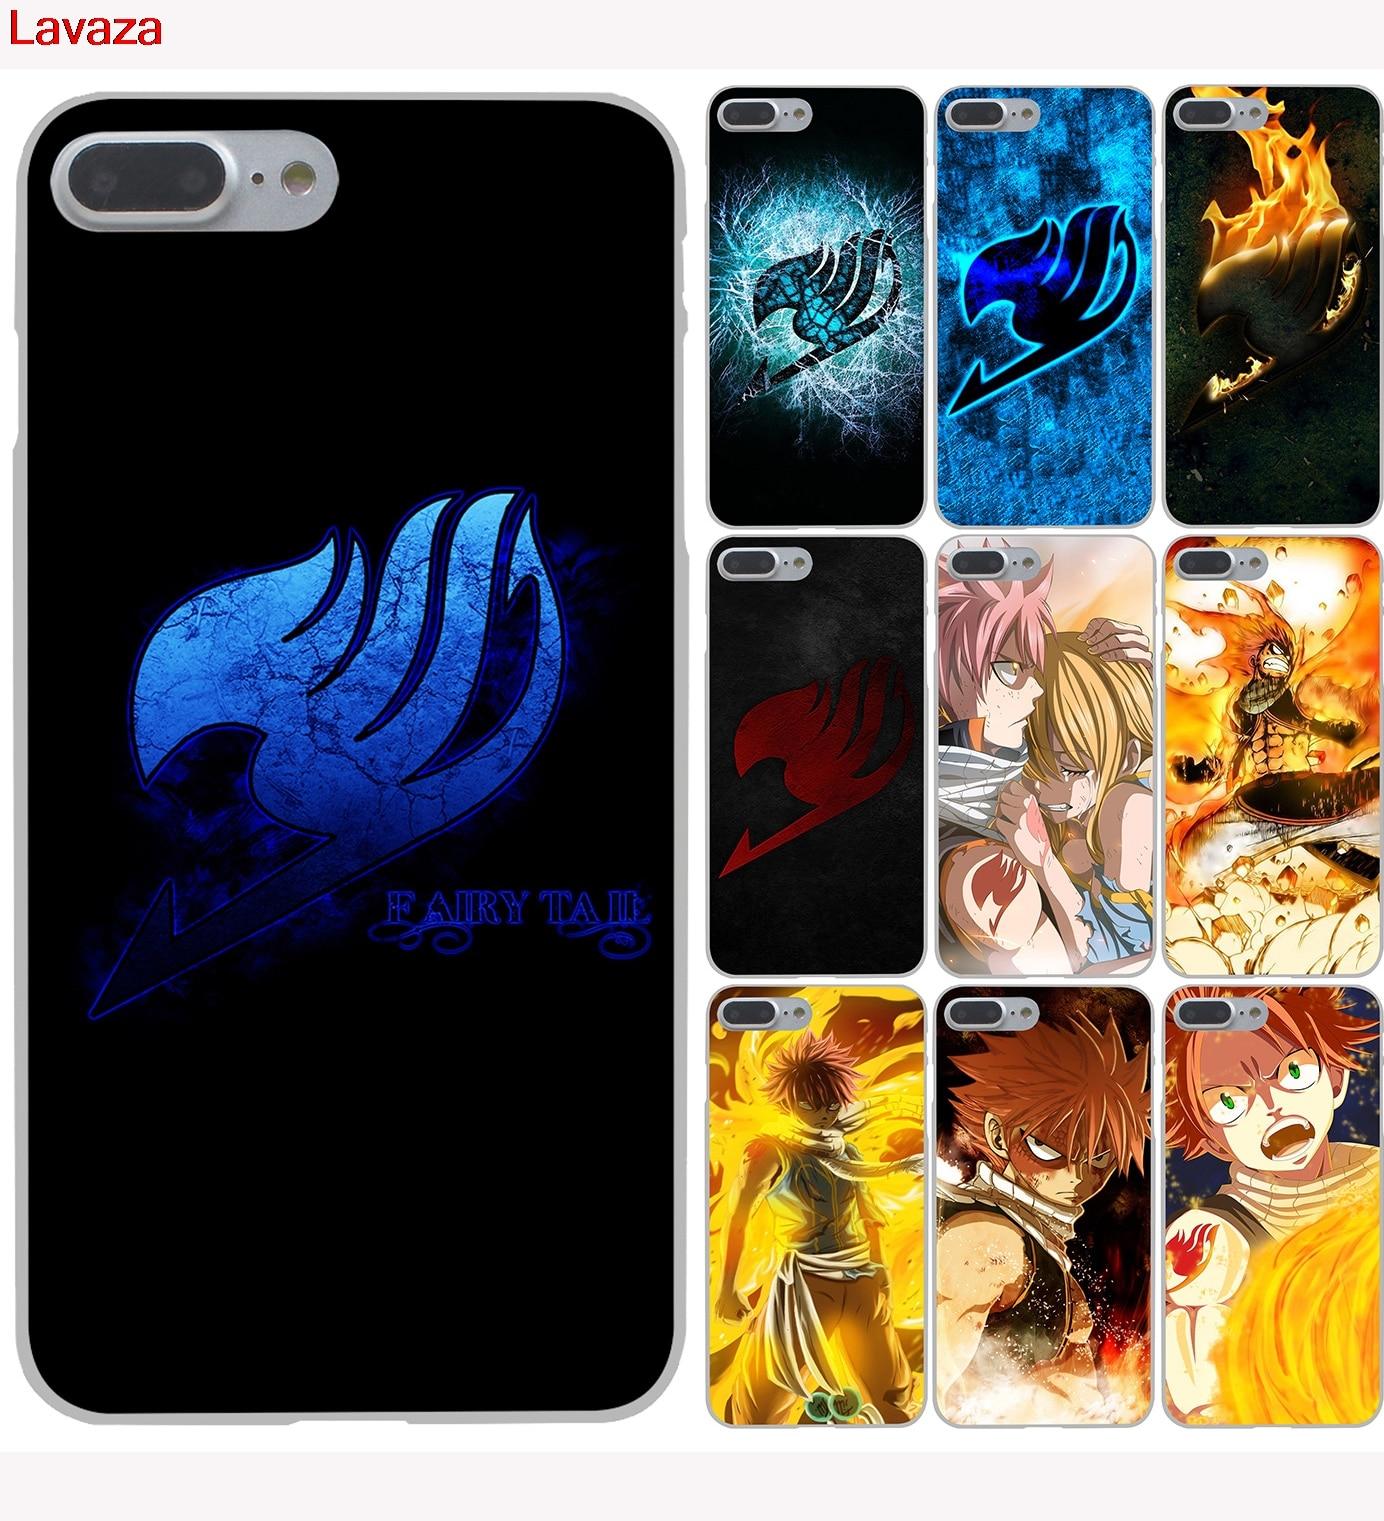 Lavaza Anime Manga Fairy Tail Hard Phone Case For Apple IPhone X 10 8 7 6 6s Plus 5 5S SE 5C 4